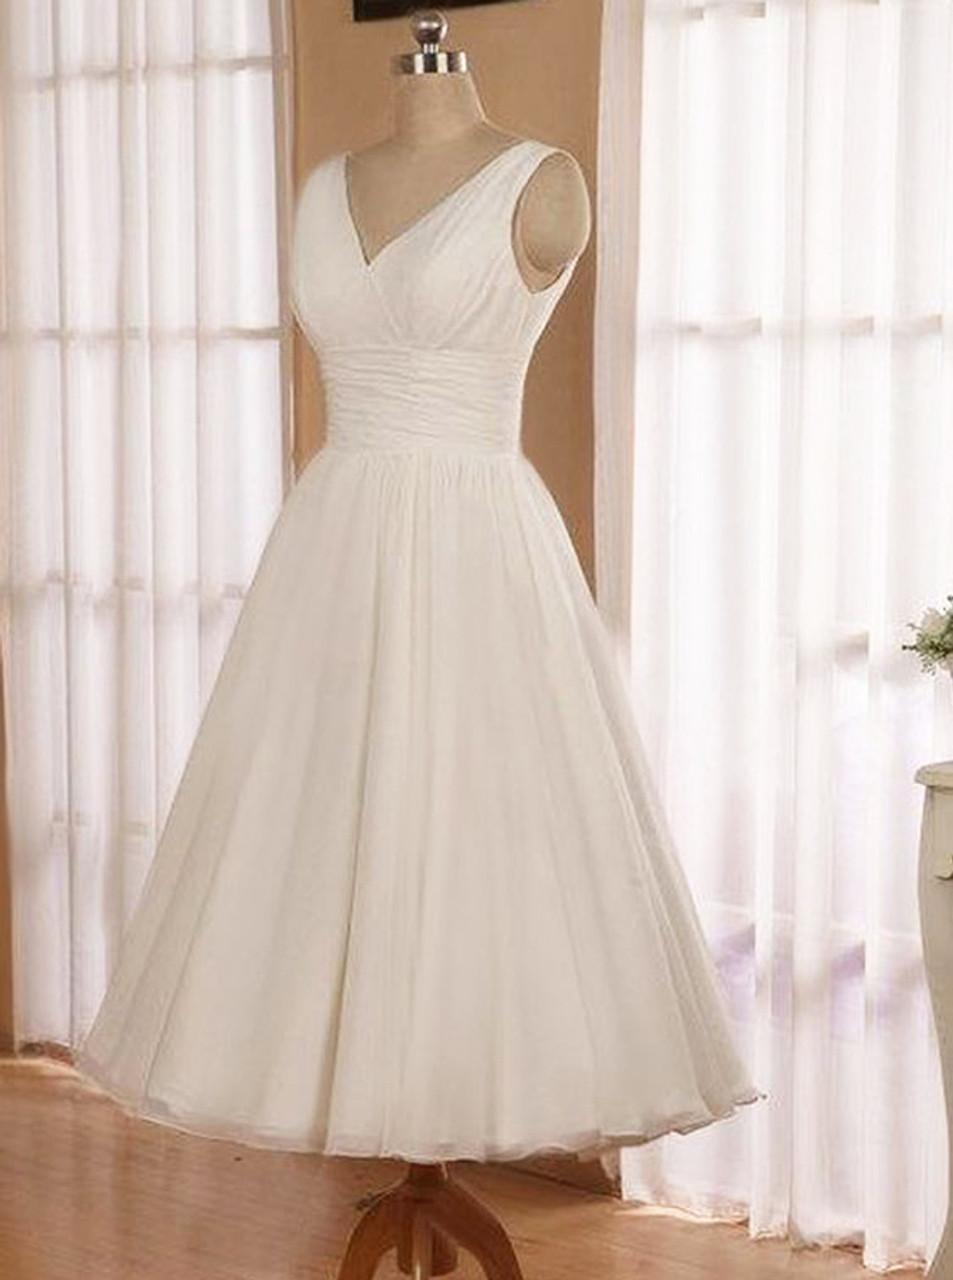 Casual Wedding Dress.Tea Length Short Wedding Dress Wedding Reception Dress Simple Casual Bridal Dress 11140